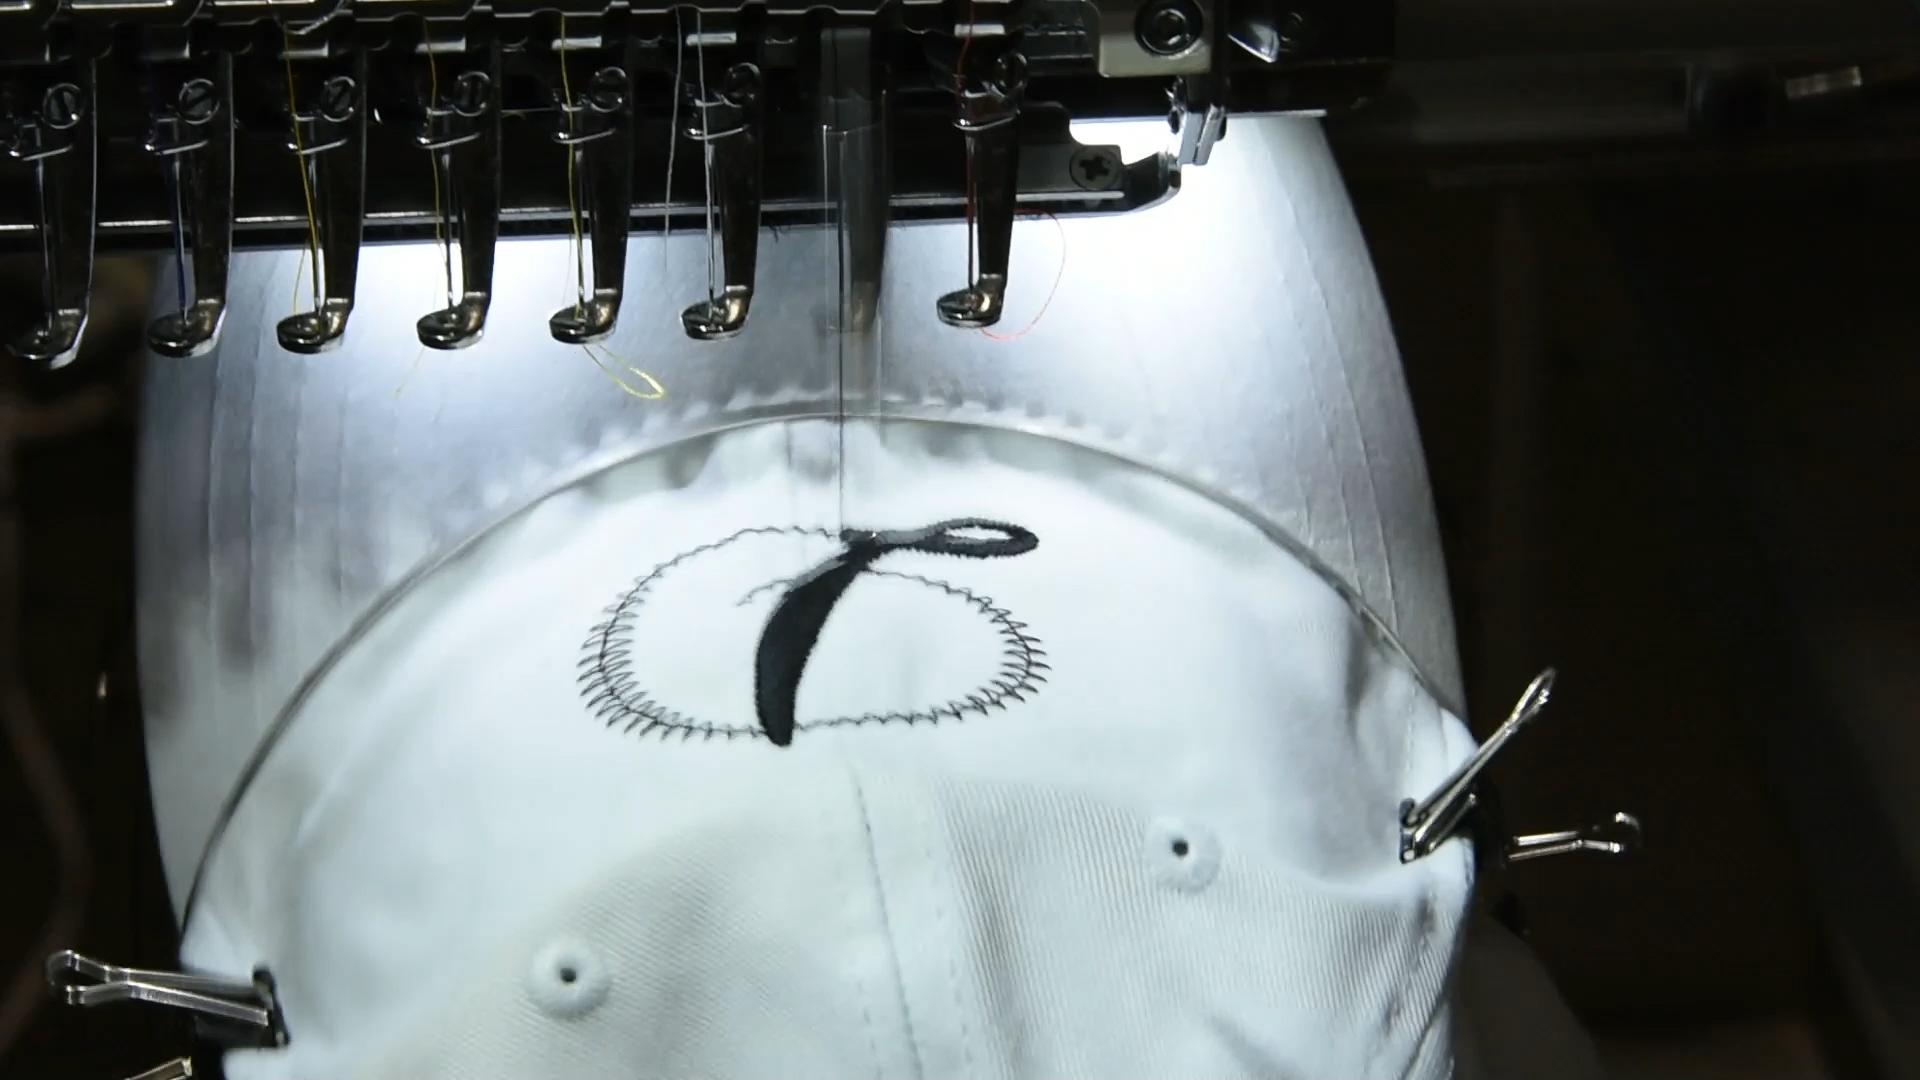 Monogram D Cap Embroidery Machine Video Video Machine Embroidery Designs Machine Embroidery Projects Machine Embroidery Applique